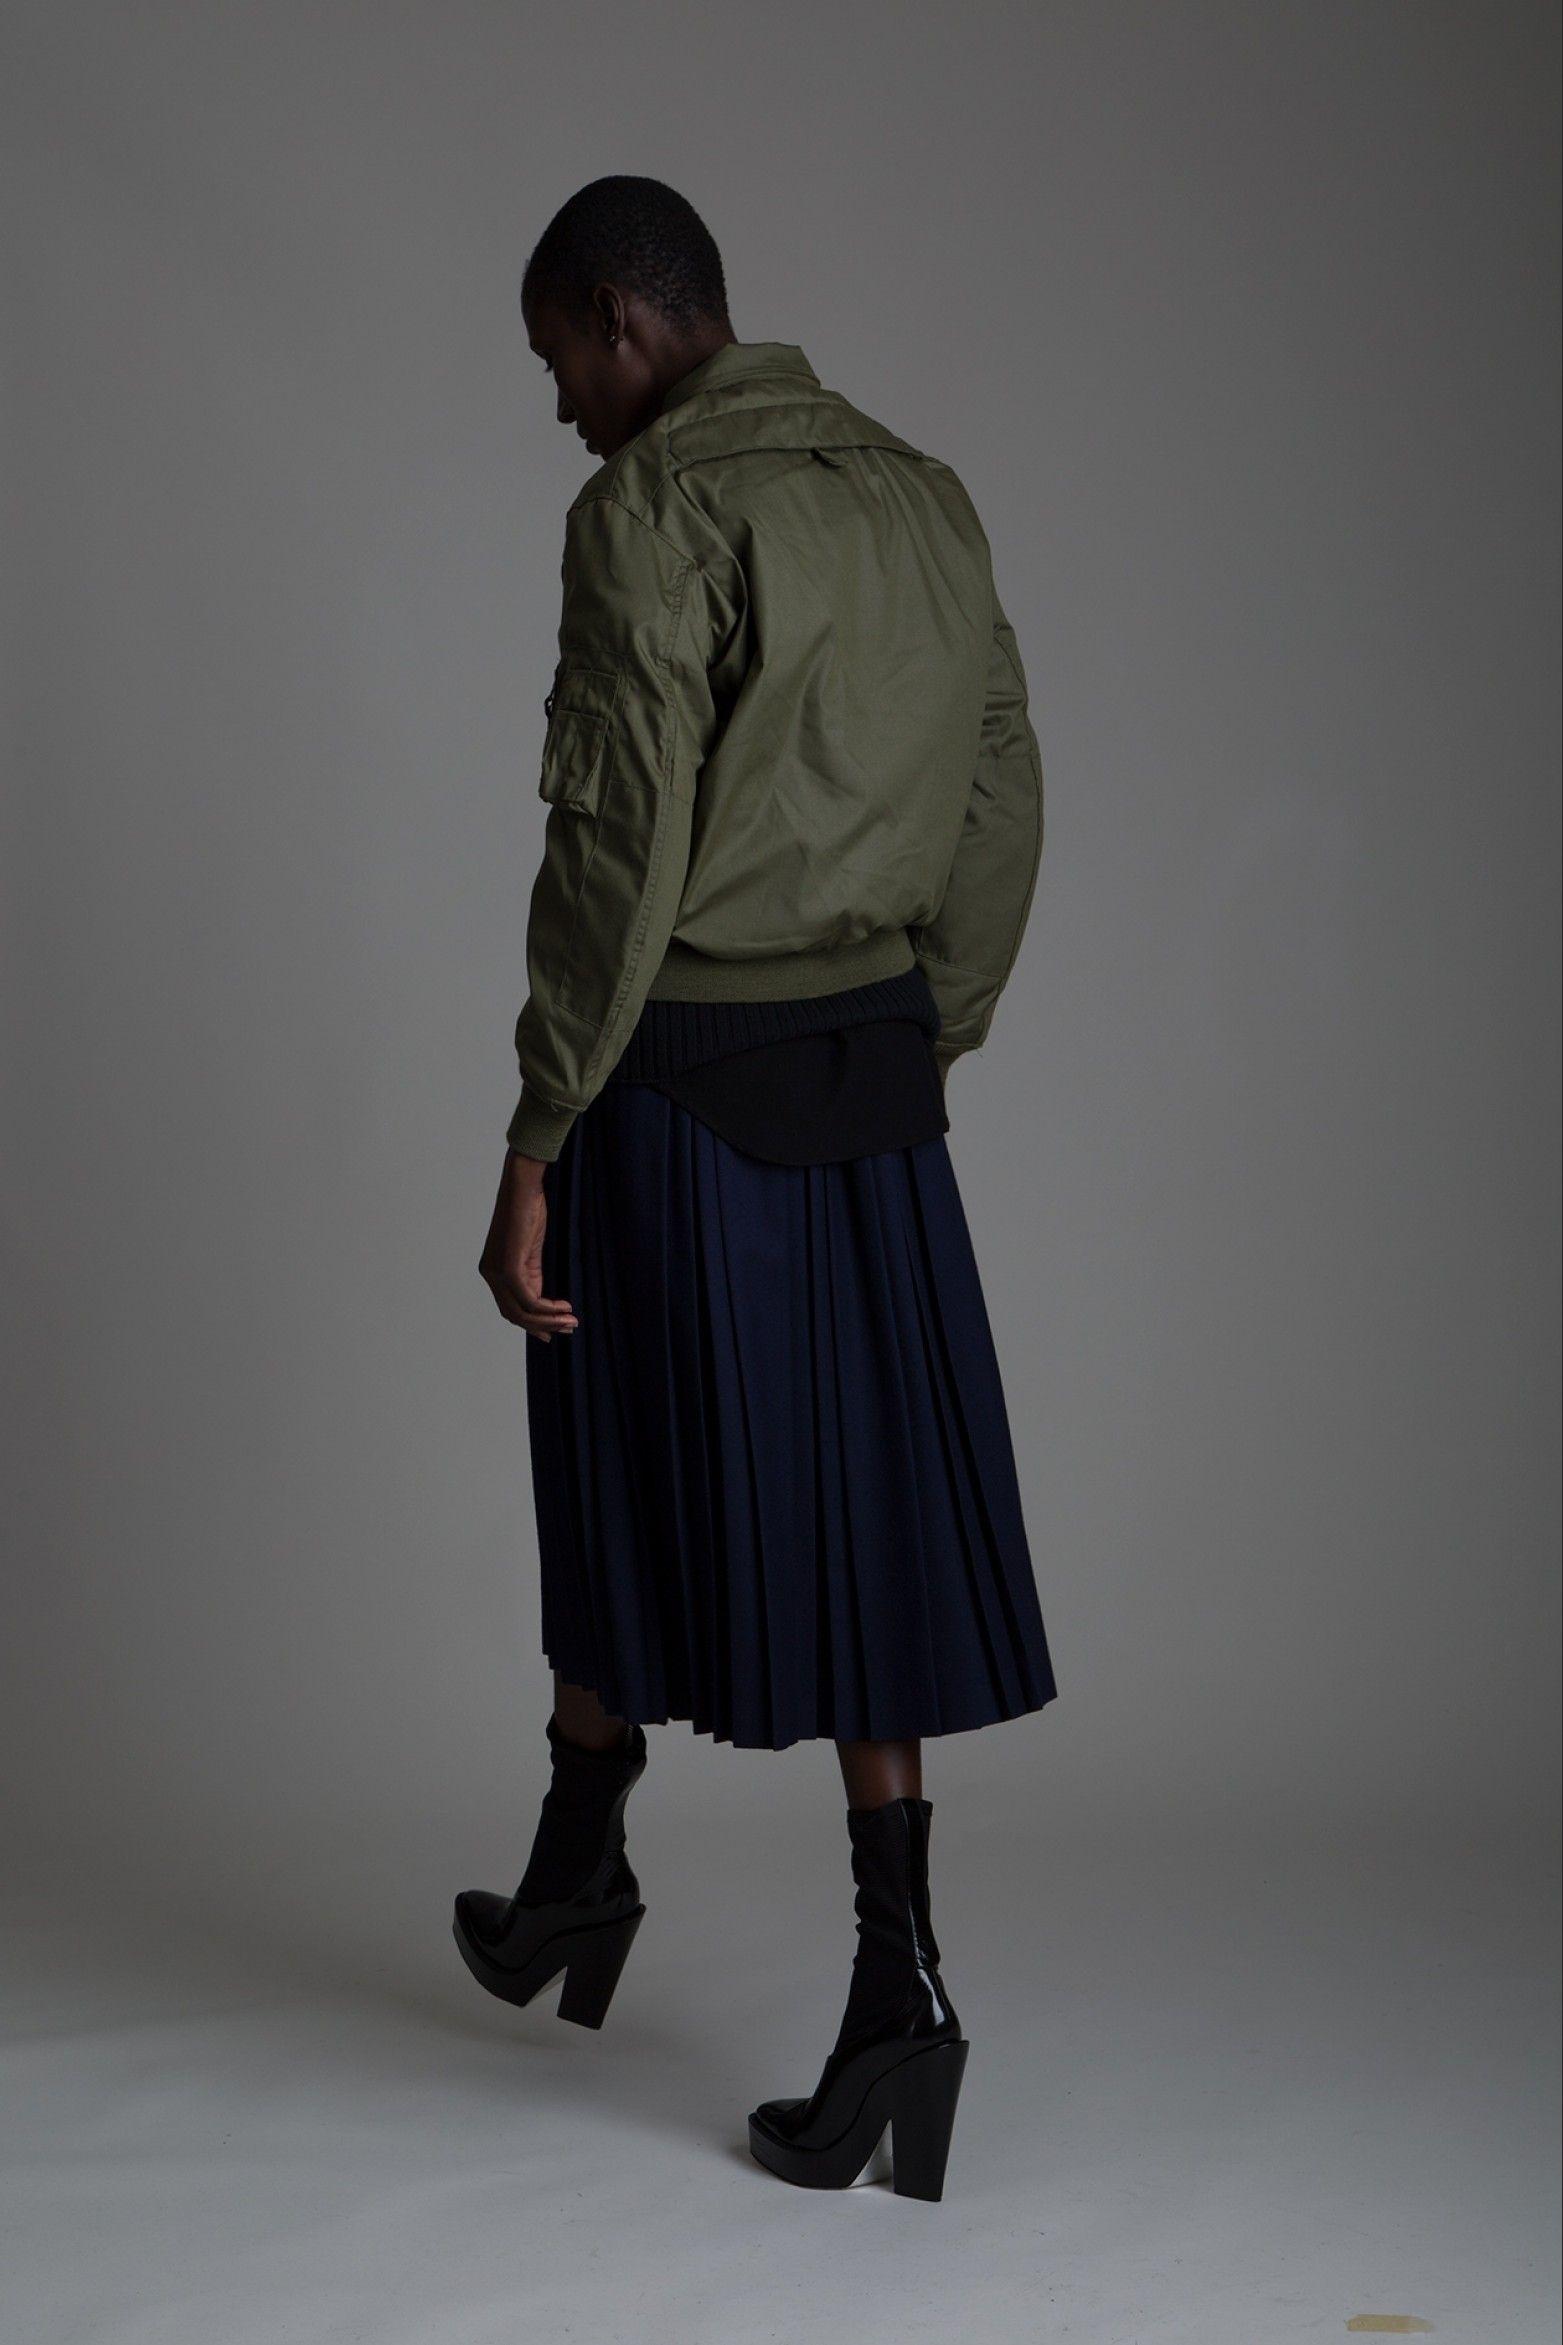 Vintage Helmut Lang Knit Vest, Adam Kimmel Shirt, Field Manor Pleated Skirt and Military Bomber Jacket. Designer Clothing Dark Minimal Street Style Fashion